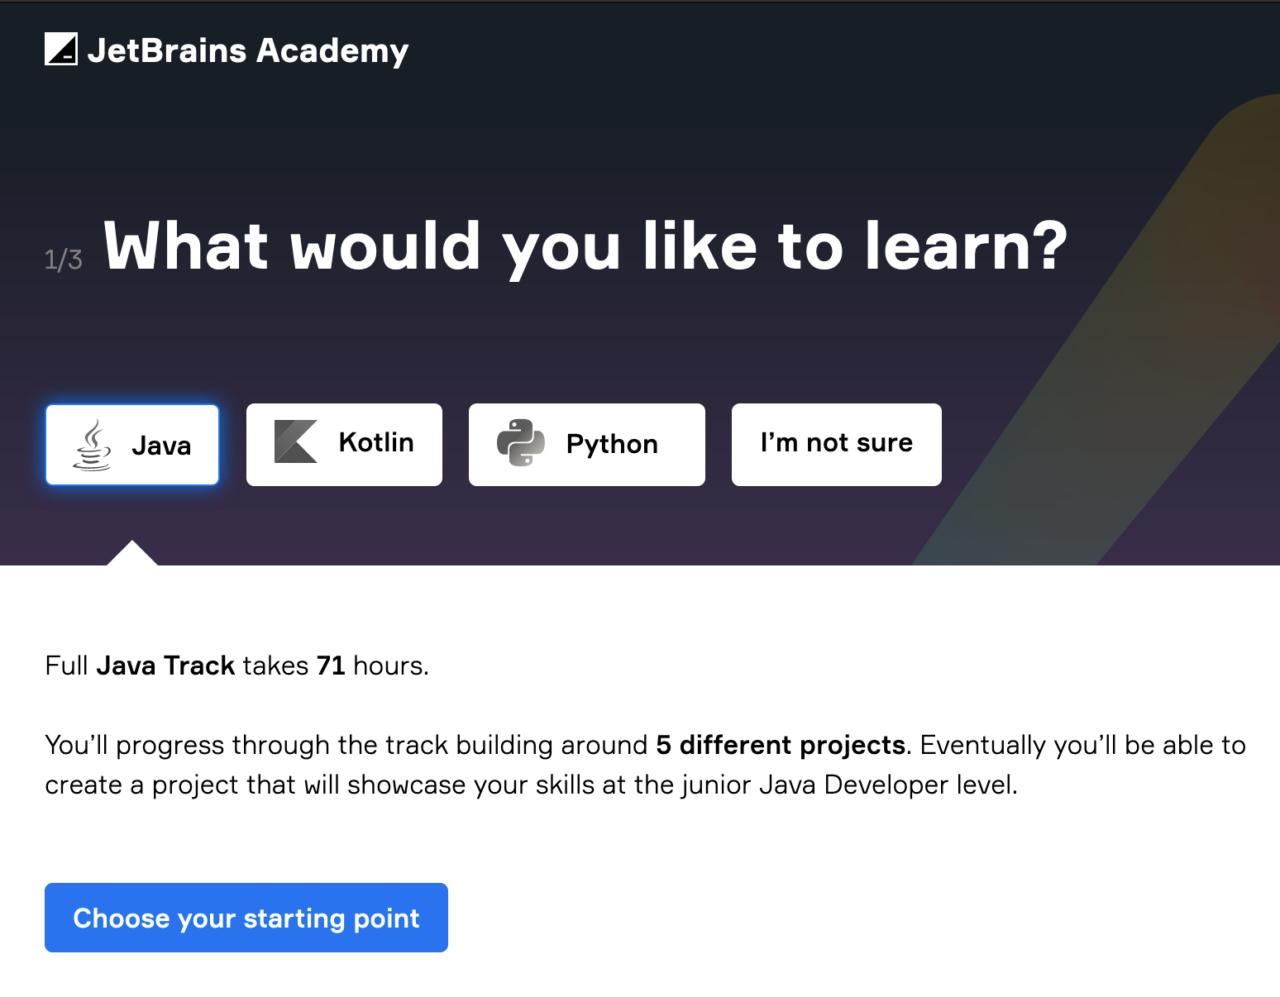 JetBrains Academy